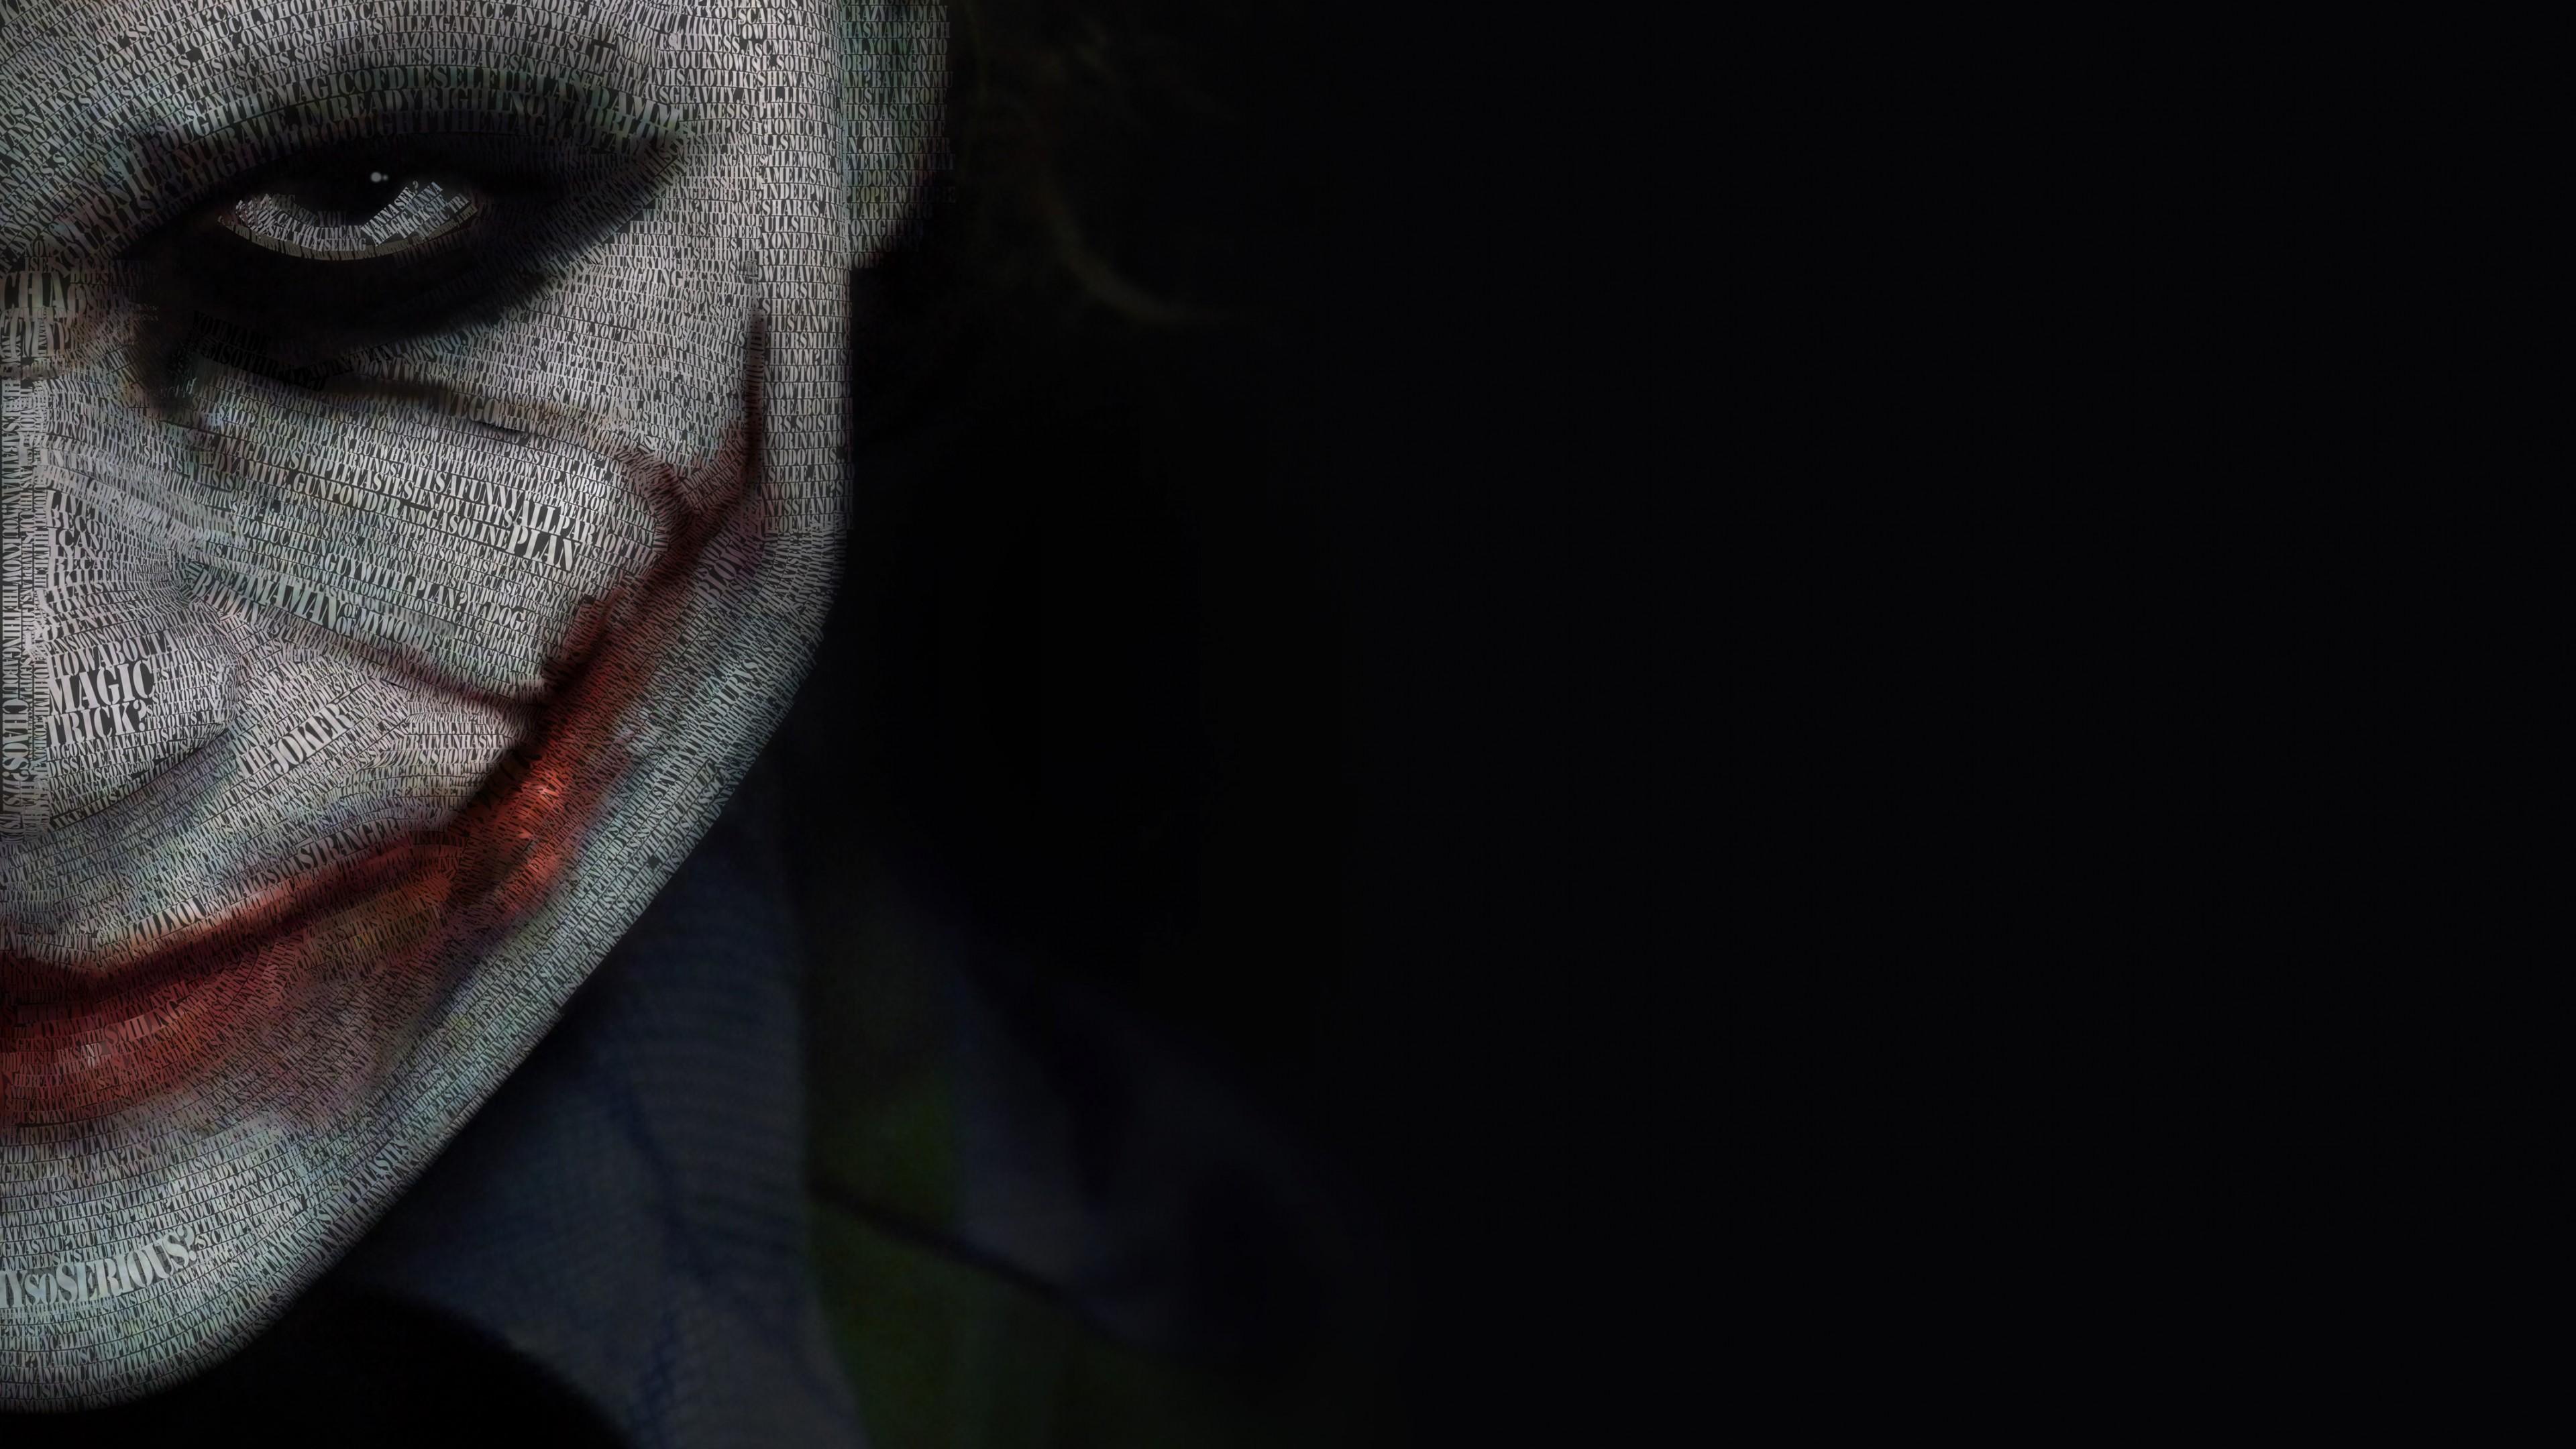 The Joker Typeface Portrait 4K wallpaper